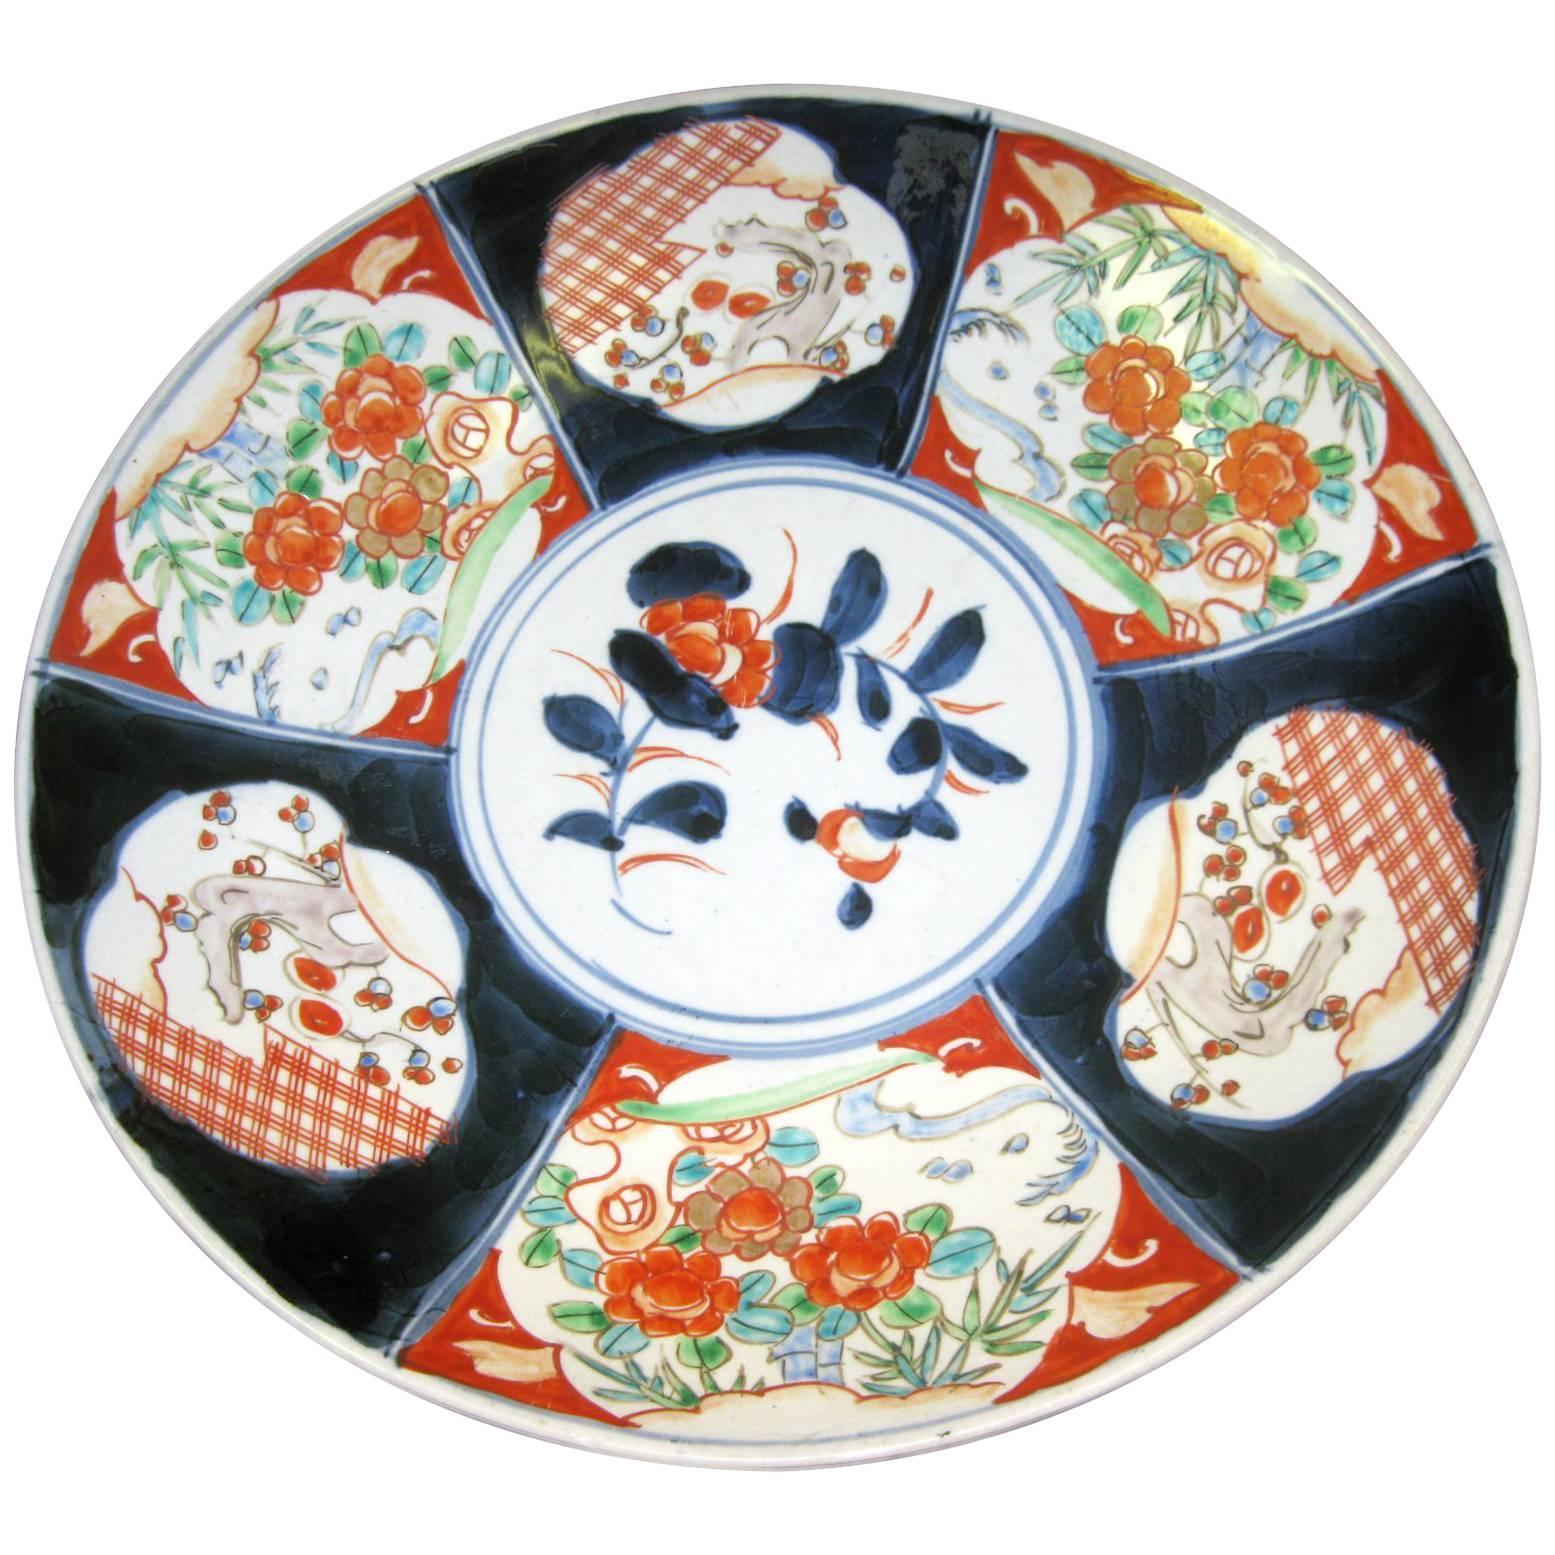 19th century Japanese Meiji Period Imari Charger